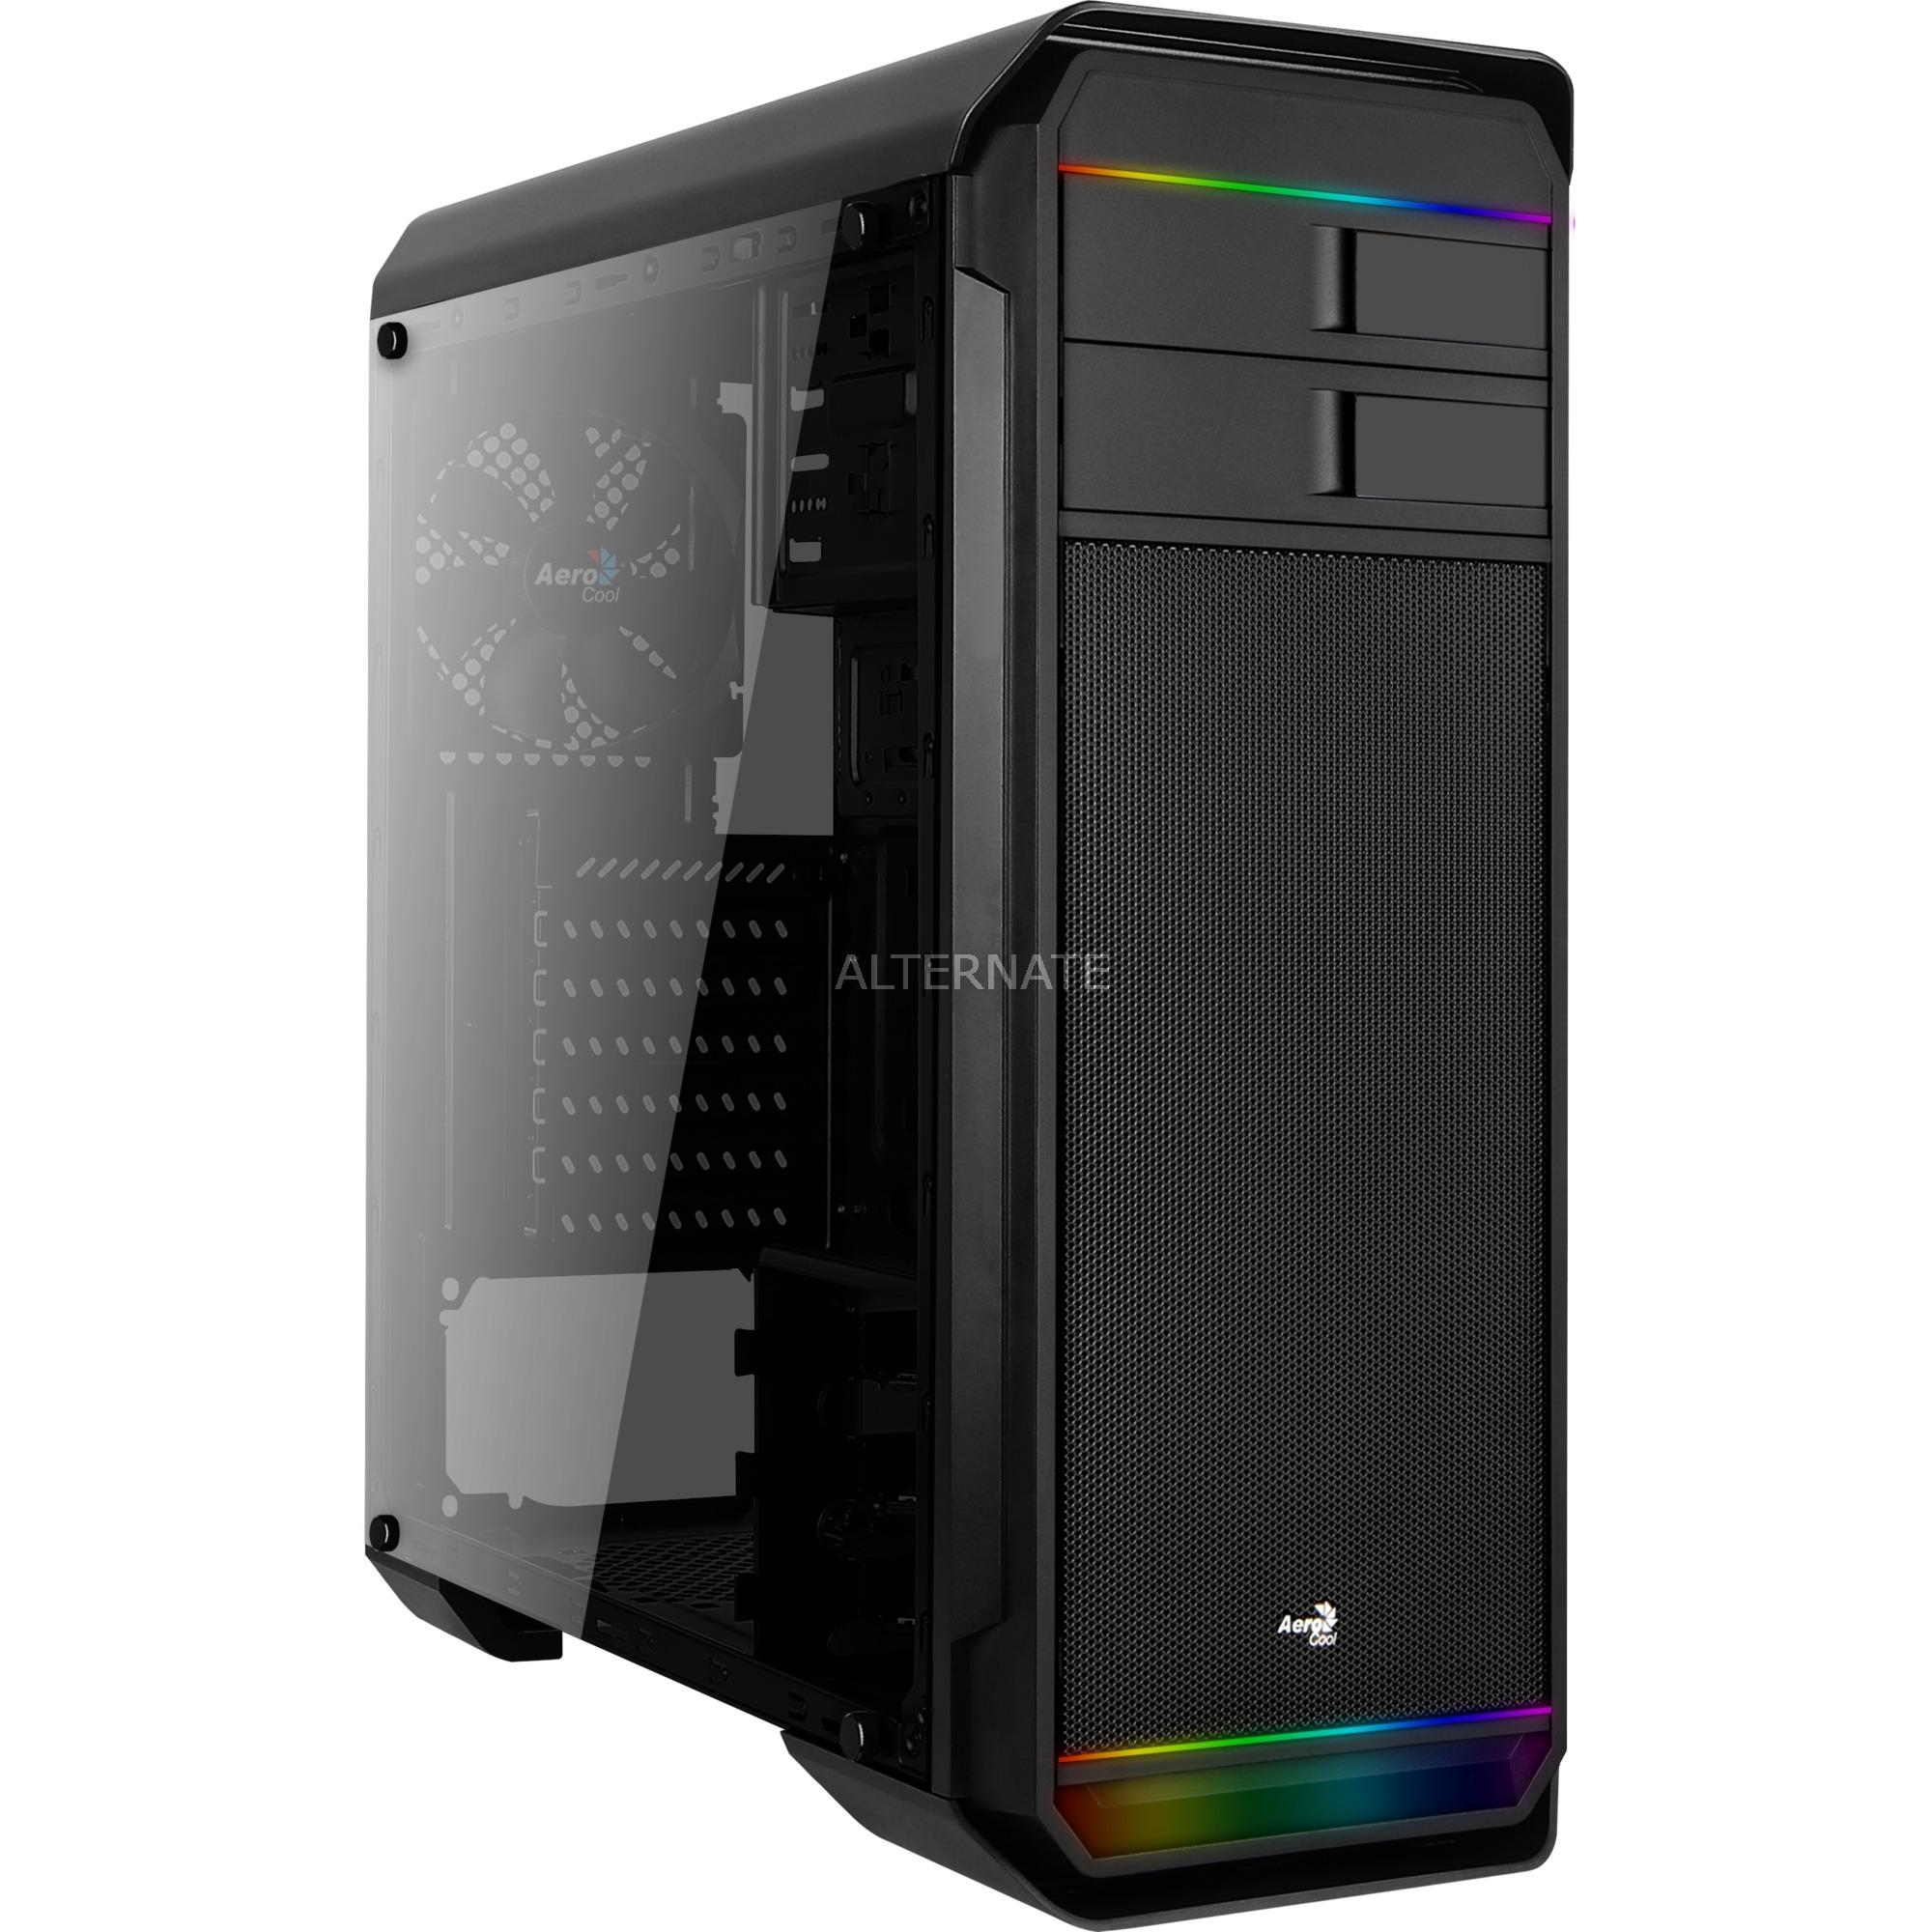 AERO500G RGB BK Midi-Tower Negro carcasa de ordenador, Cajas de torre